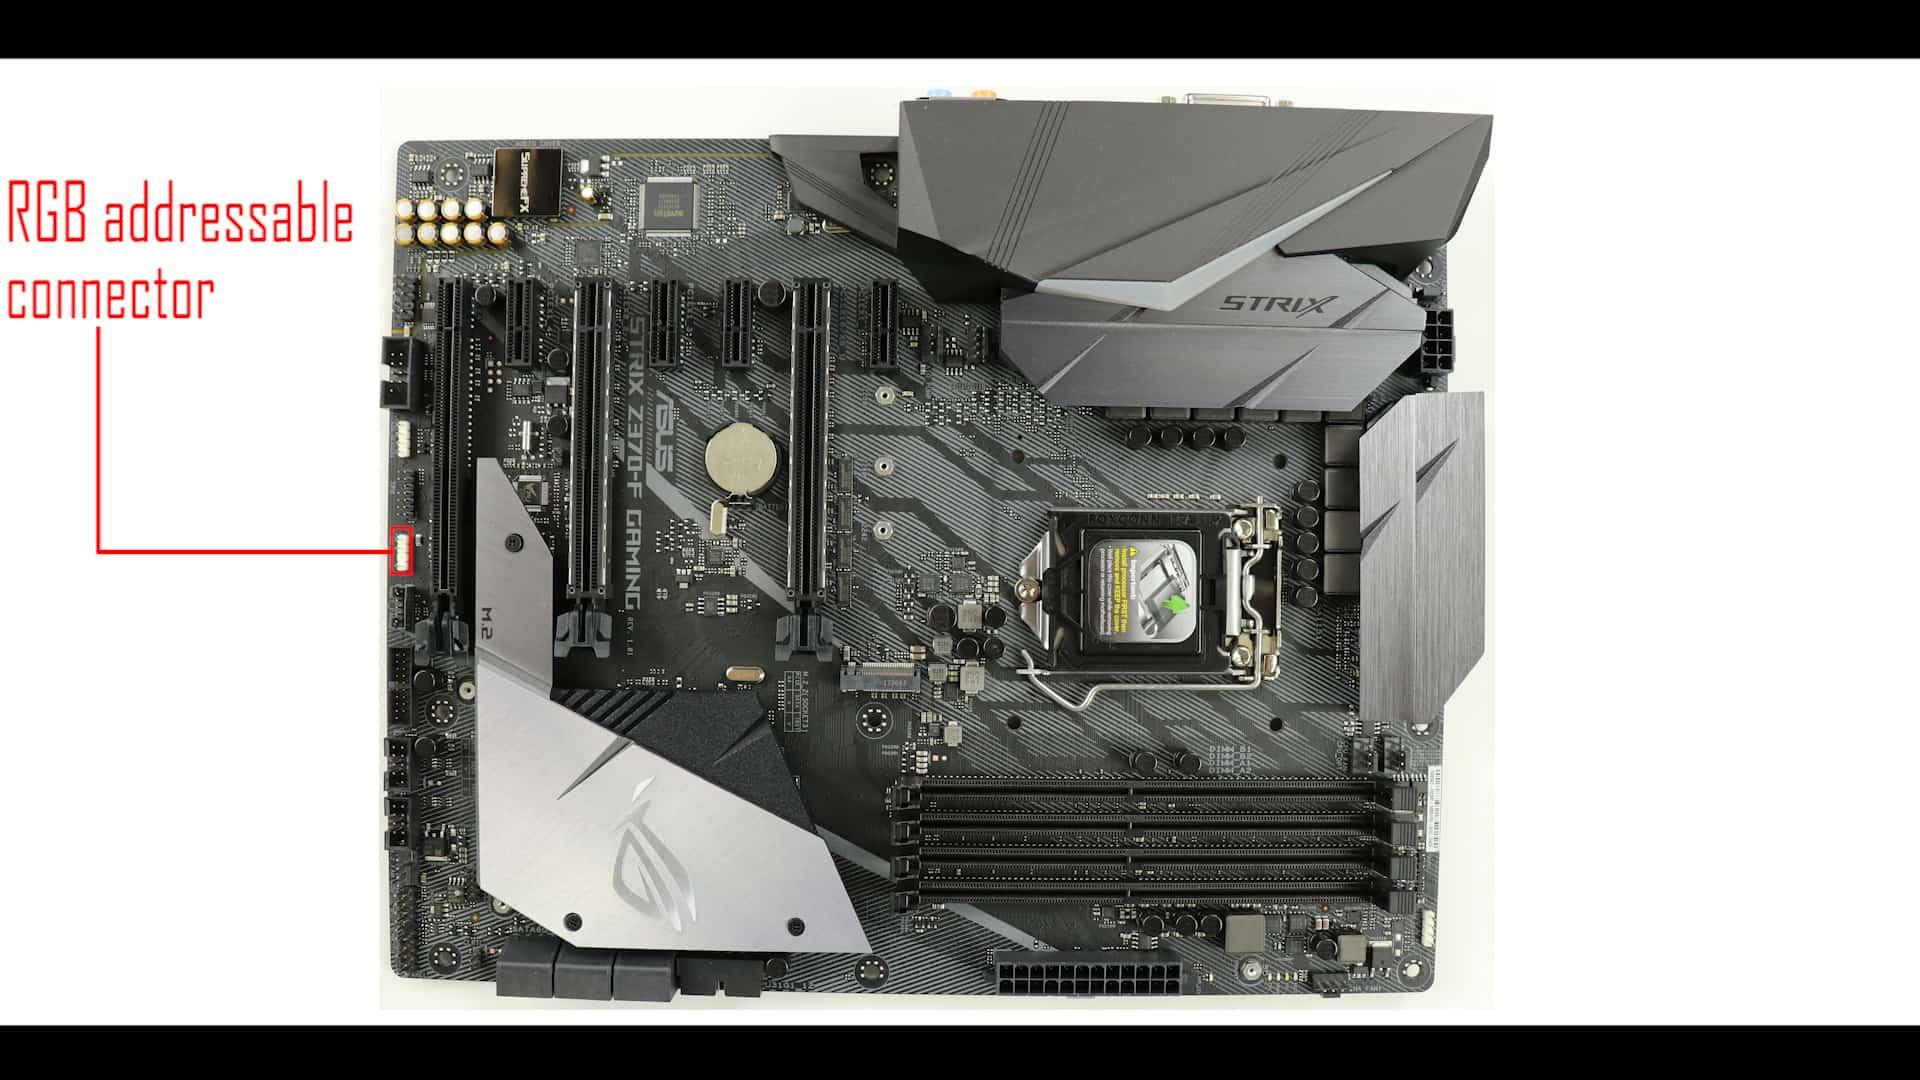 ROG STRIX Z370-F Gaming, ADDRESSABLE RGB